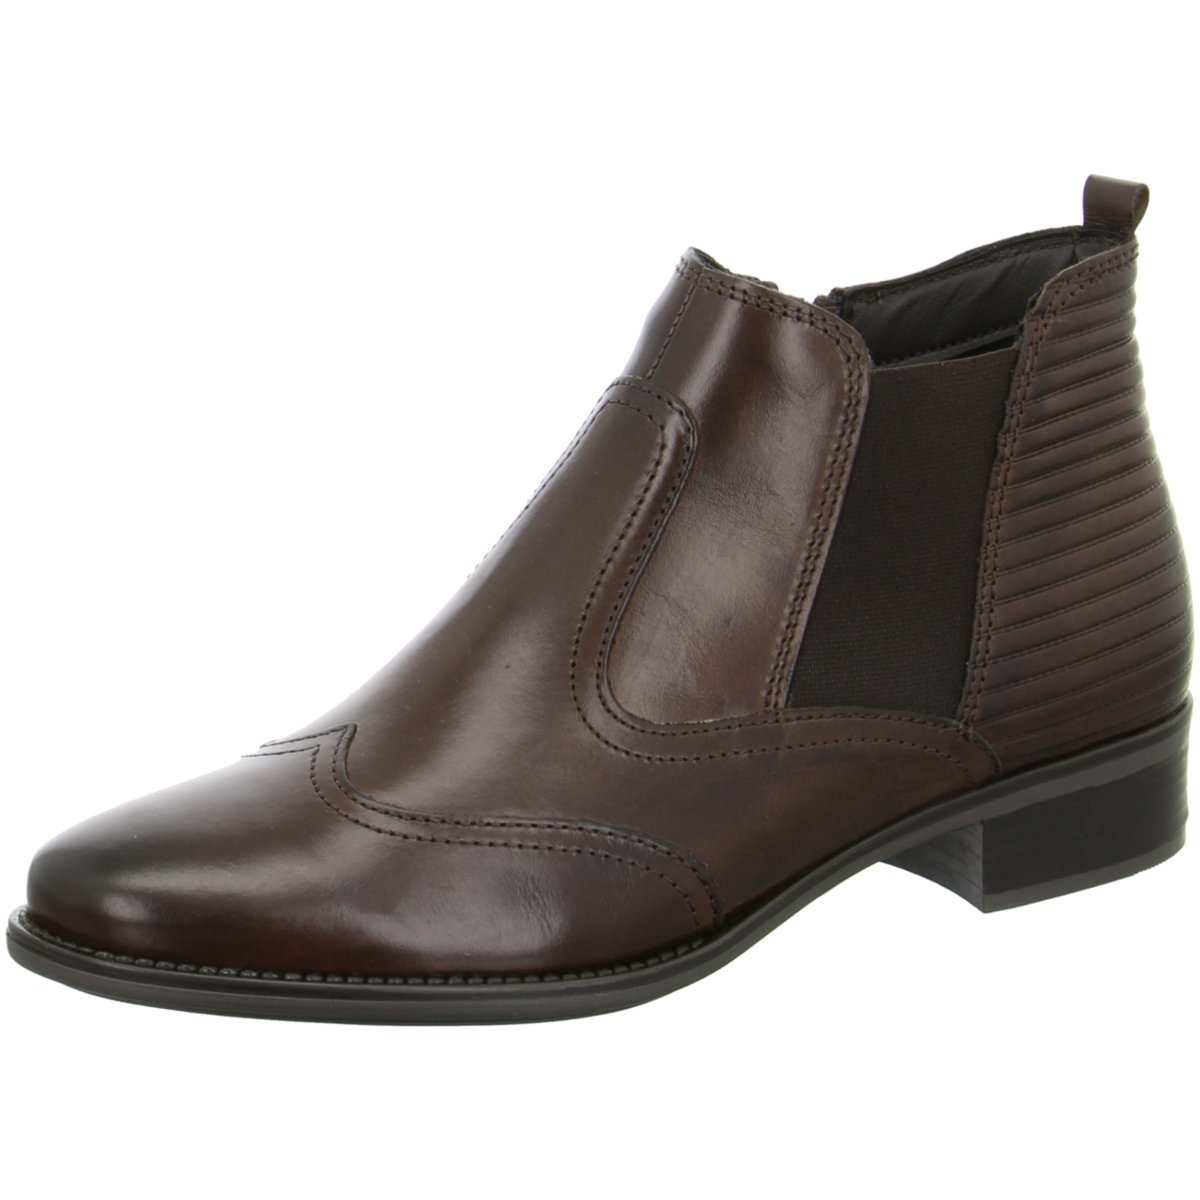 Tamaris DONE Stiefeletten & Boots schwarz Damen Schuhe Leder